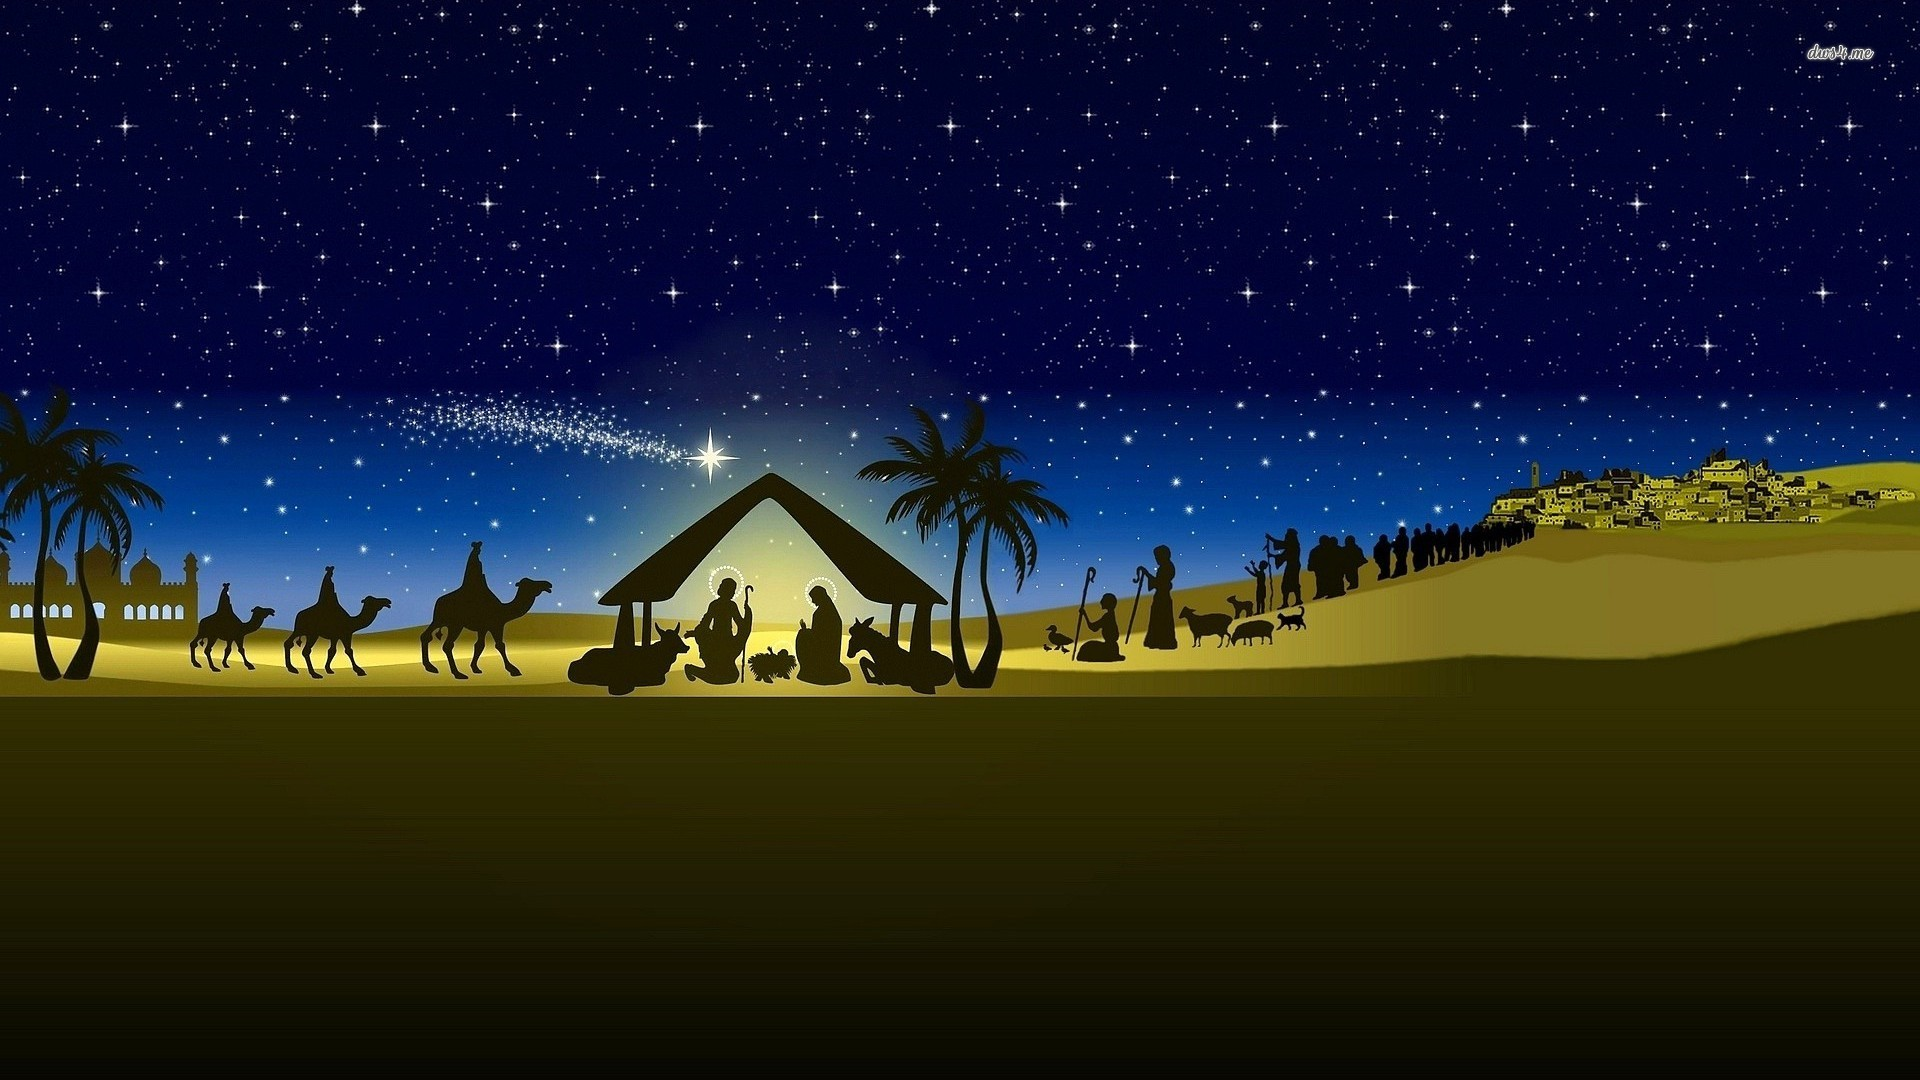 nativity scenes   Nativity scene Papel de Parede Imagem   Nativity Scenes    Pinterest   Christmas nativity